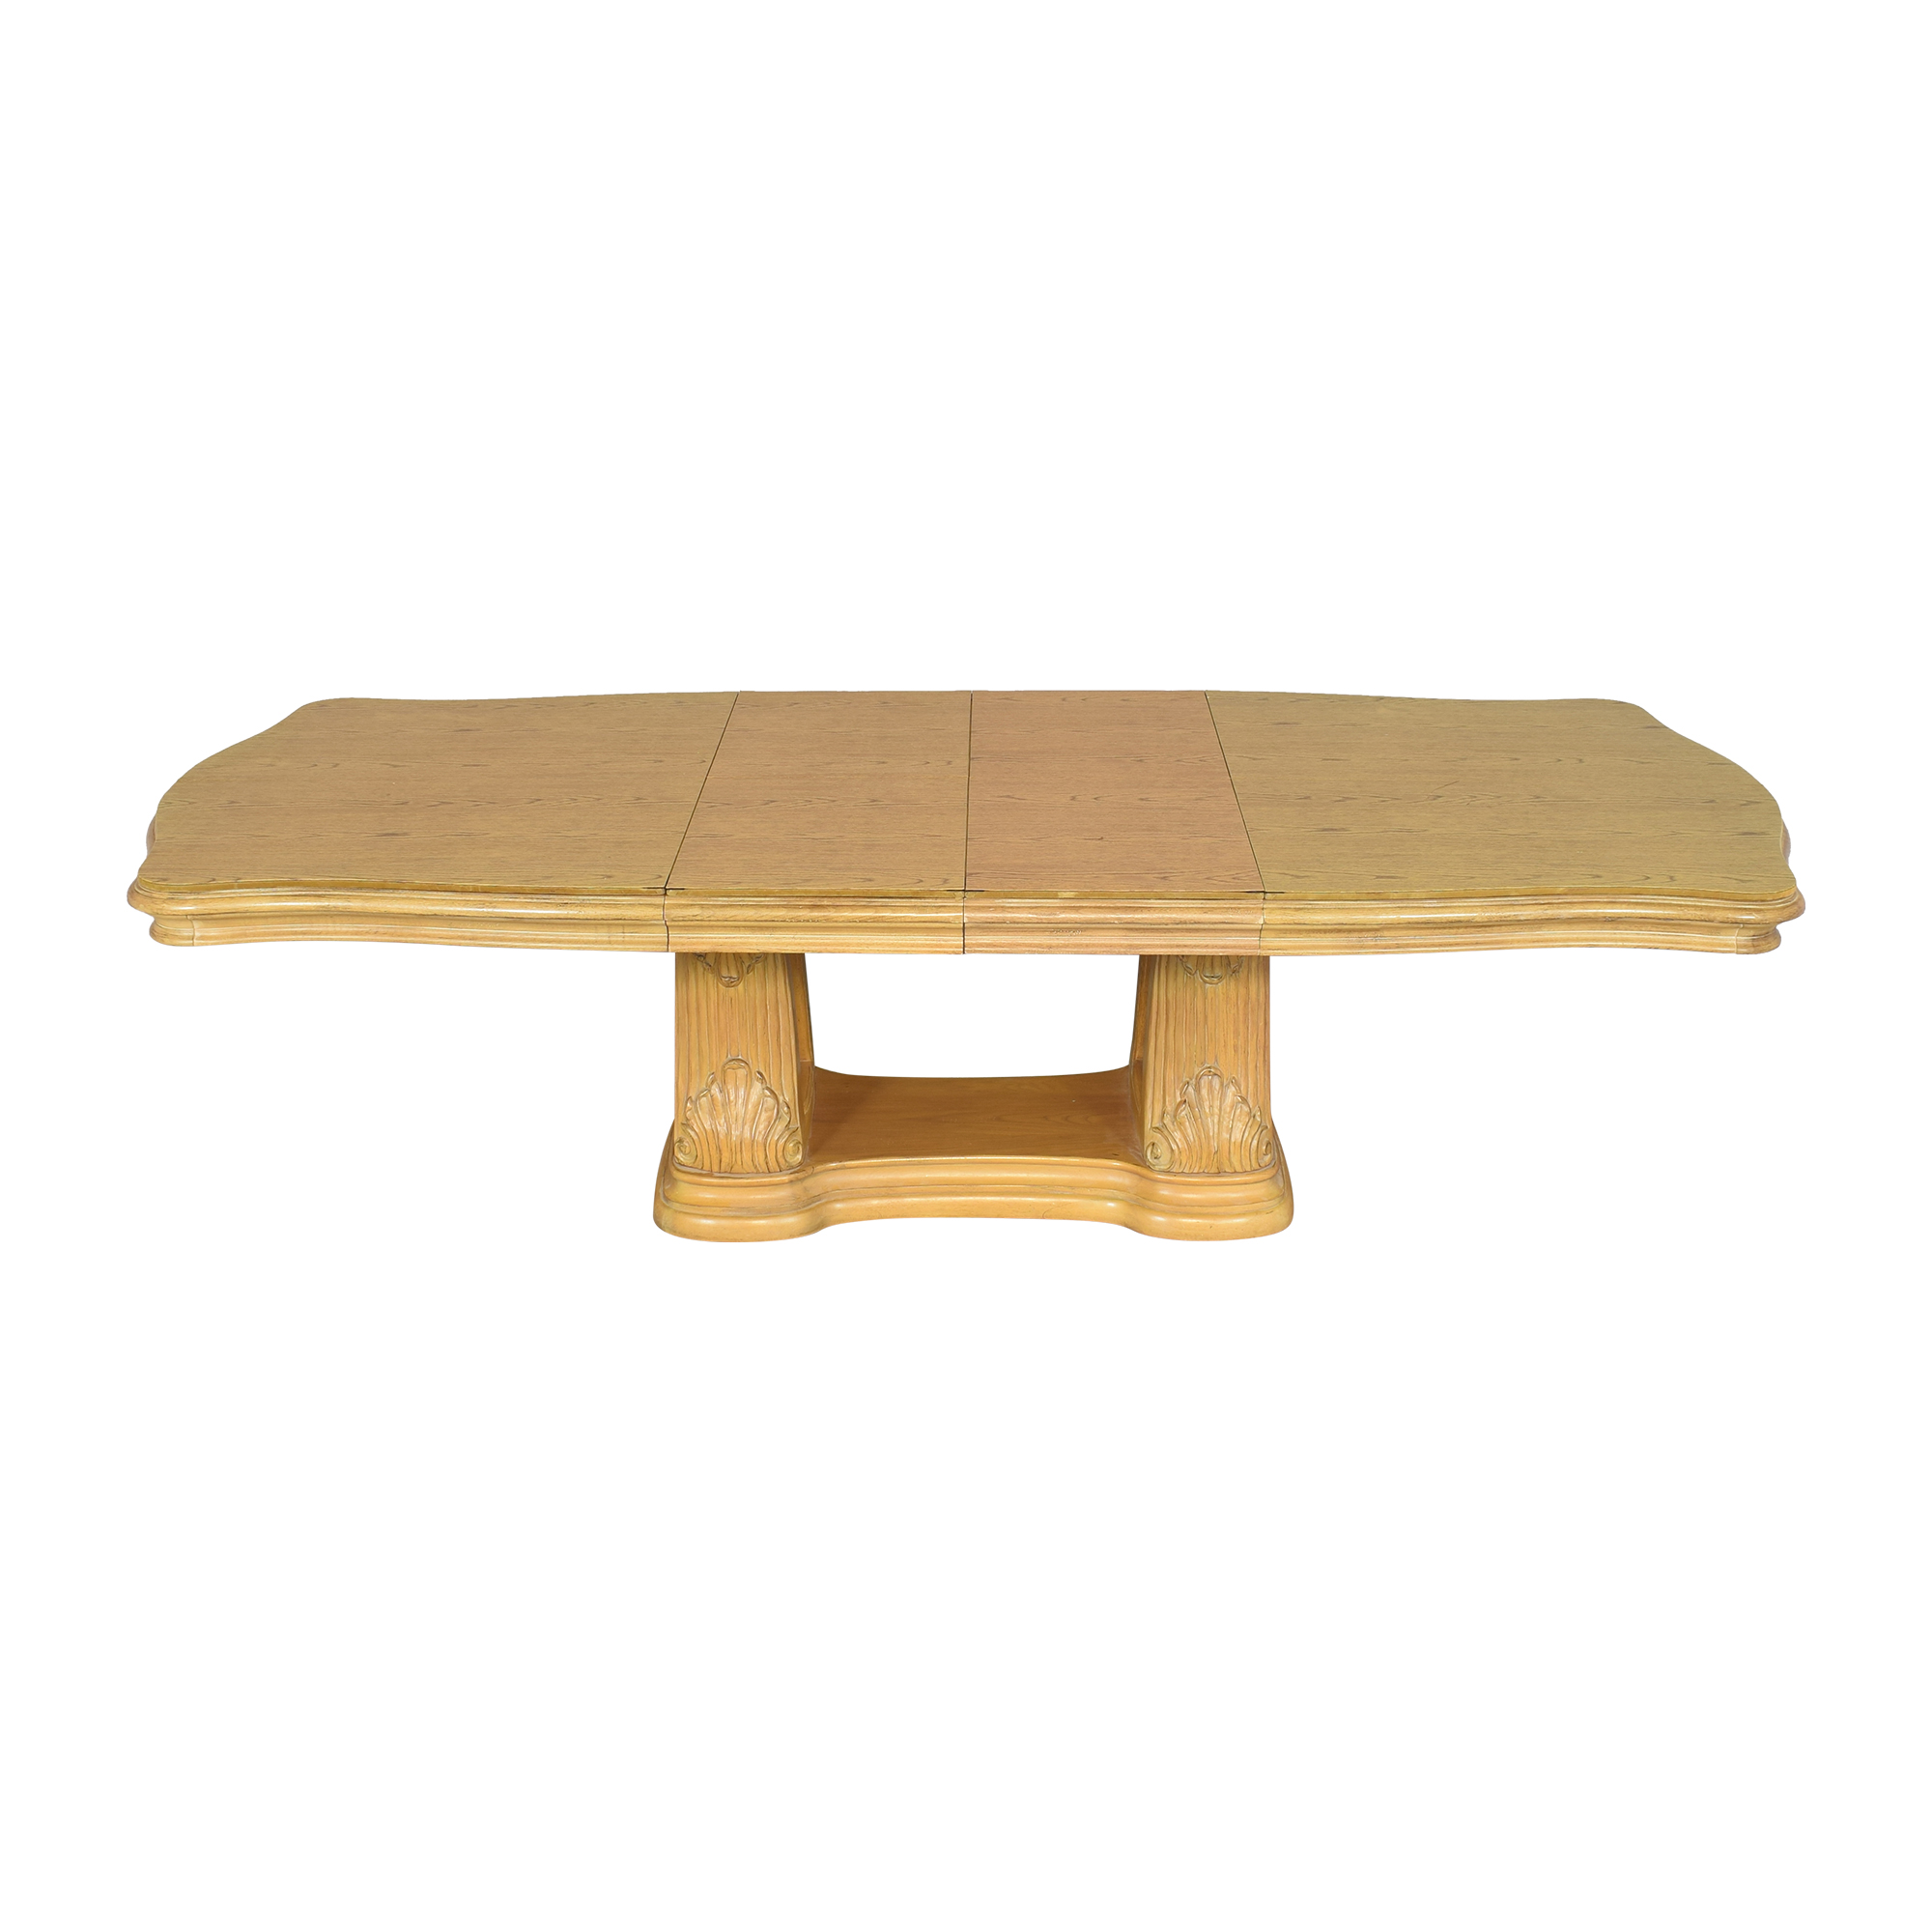 Bernhardt Bernhardt Extension Dining Table on sale